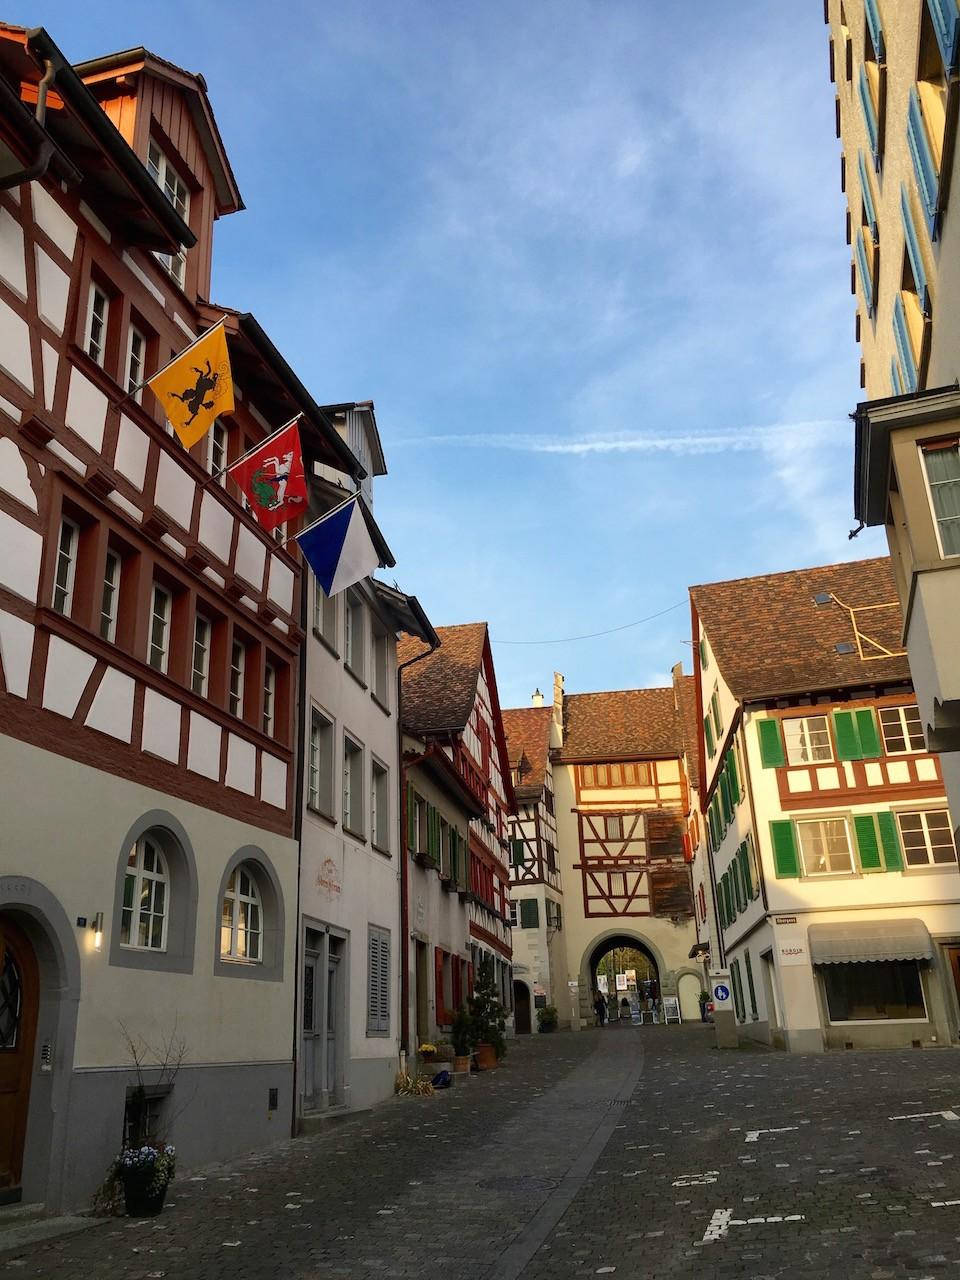 stein am Rhein cidade medieval